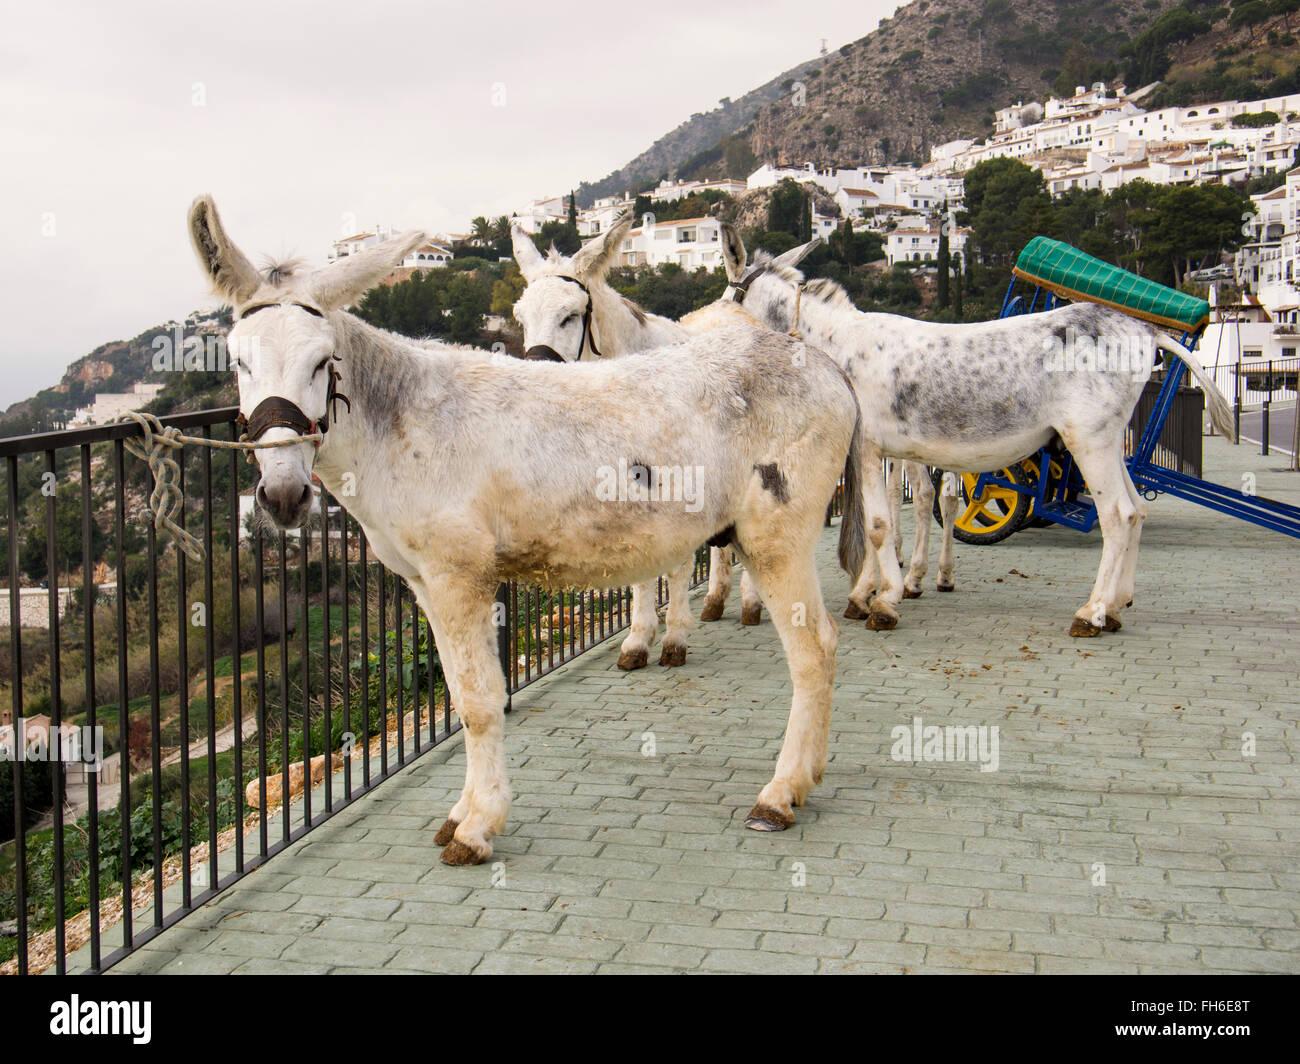 Typische Esel Esel Taxi, weiße Dorf Mijas, Provinz Malaga Costa del Sol Andalusien Südspanien Stockfoto